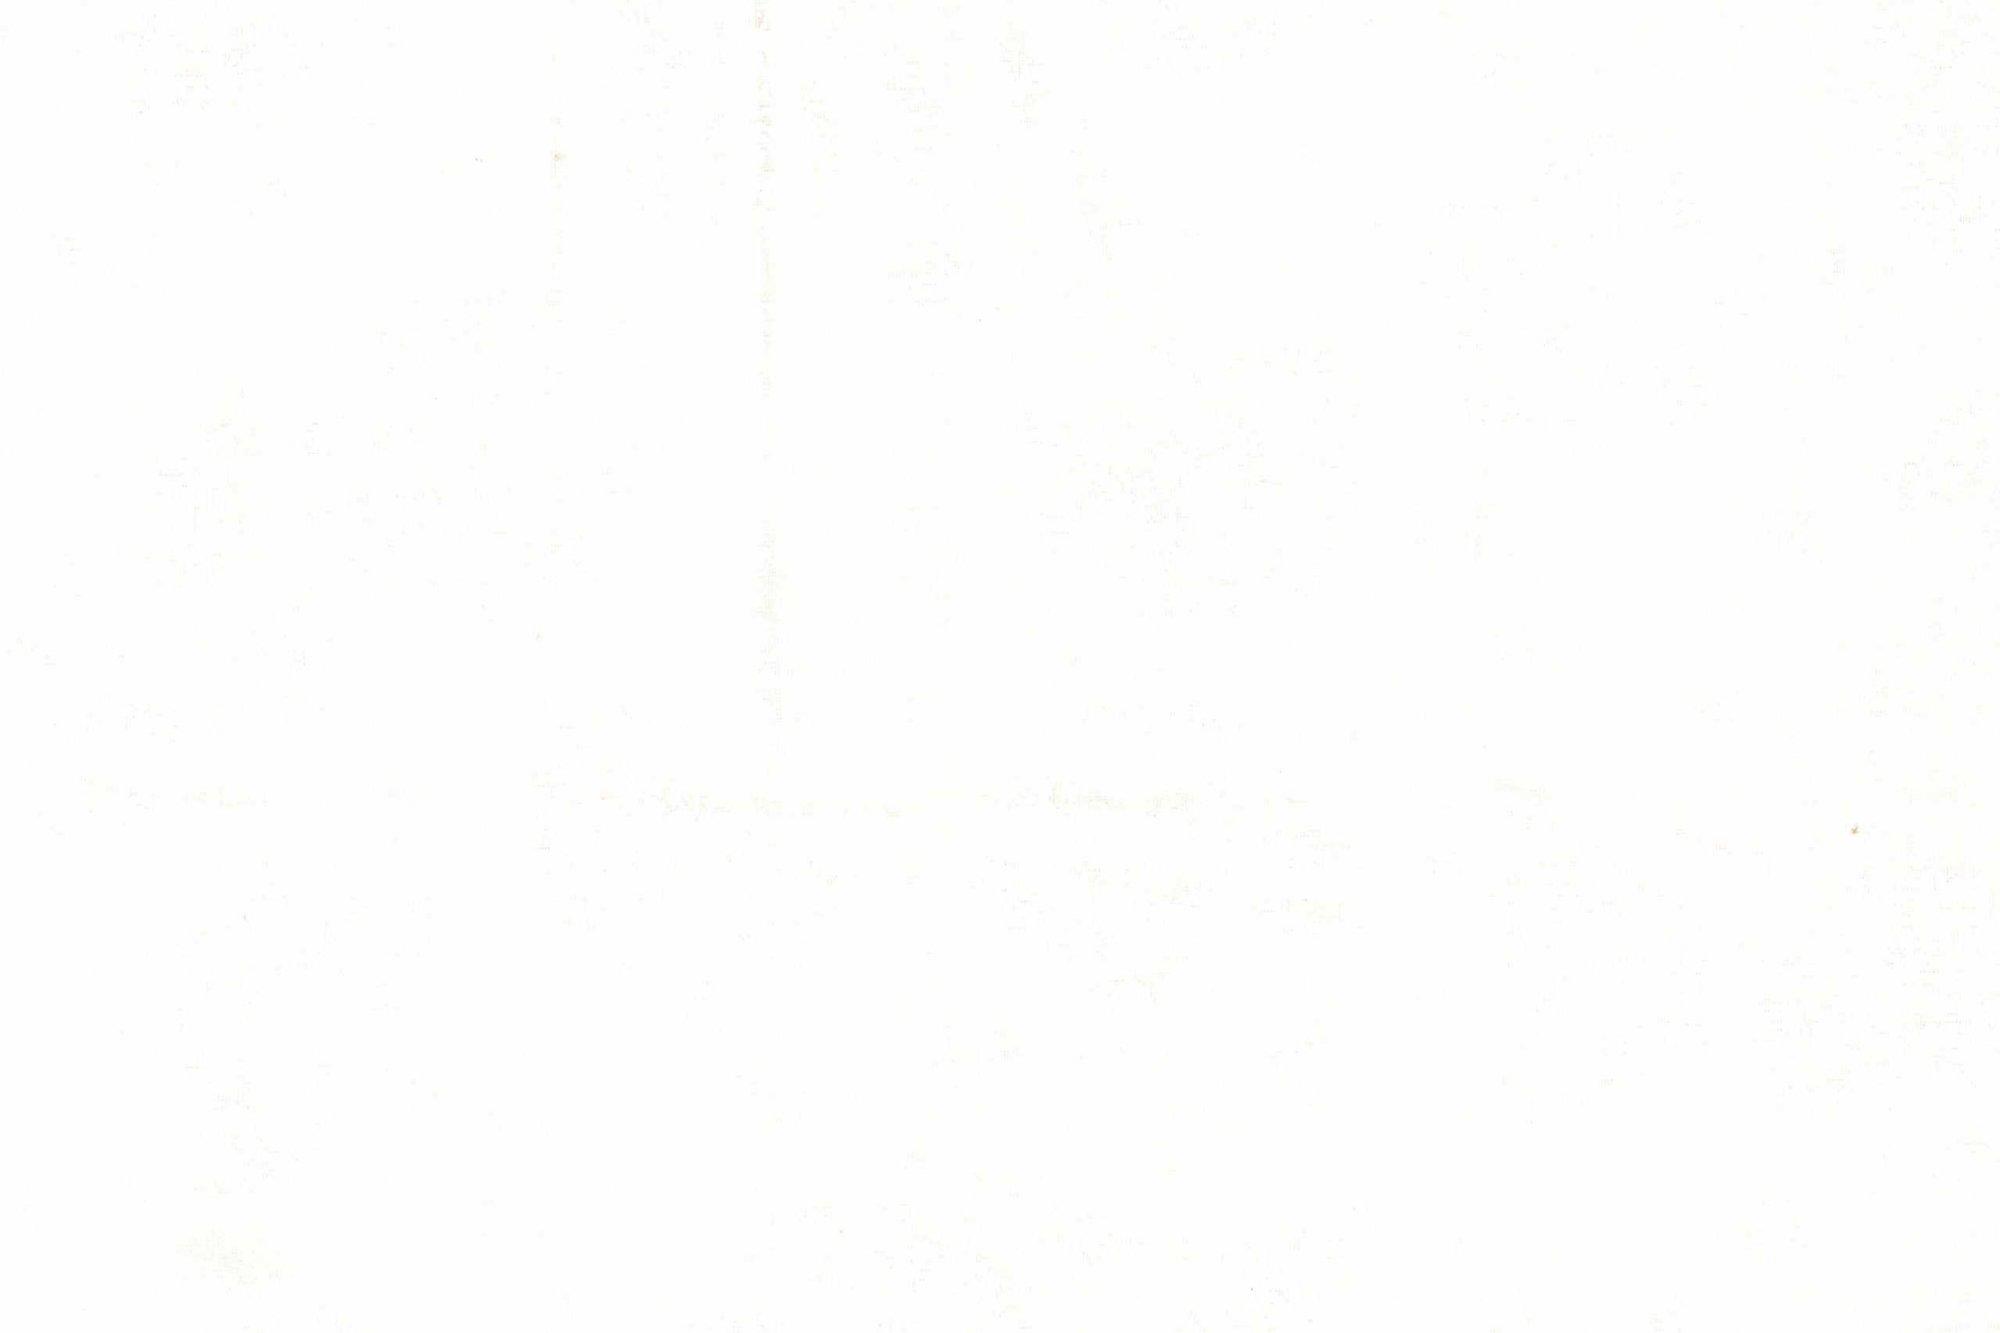 D S-P 47748 WHITE ON WHITE CIRCLE-DOTS